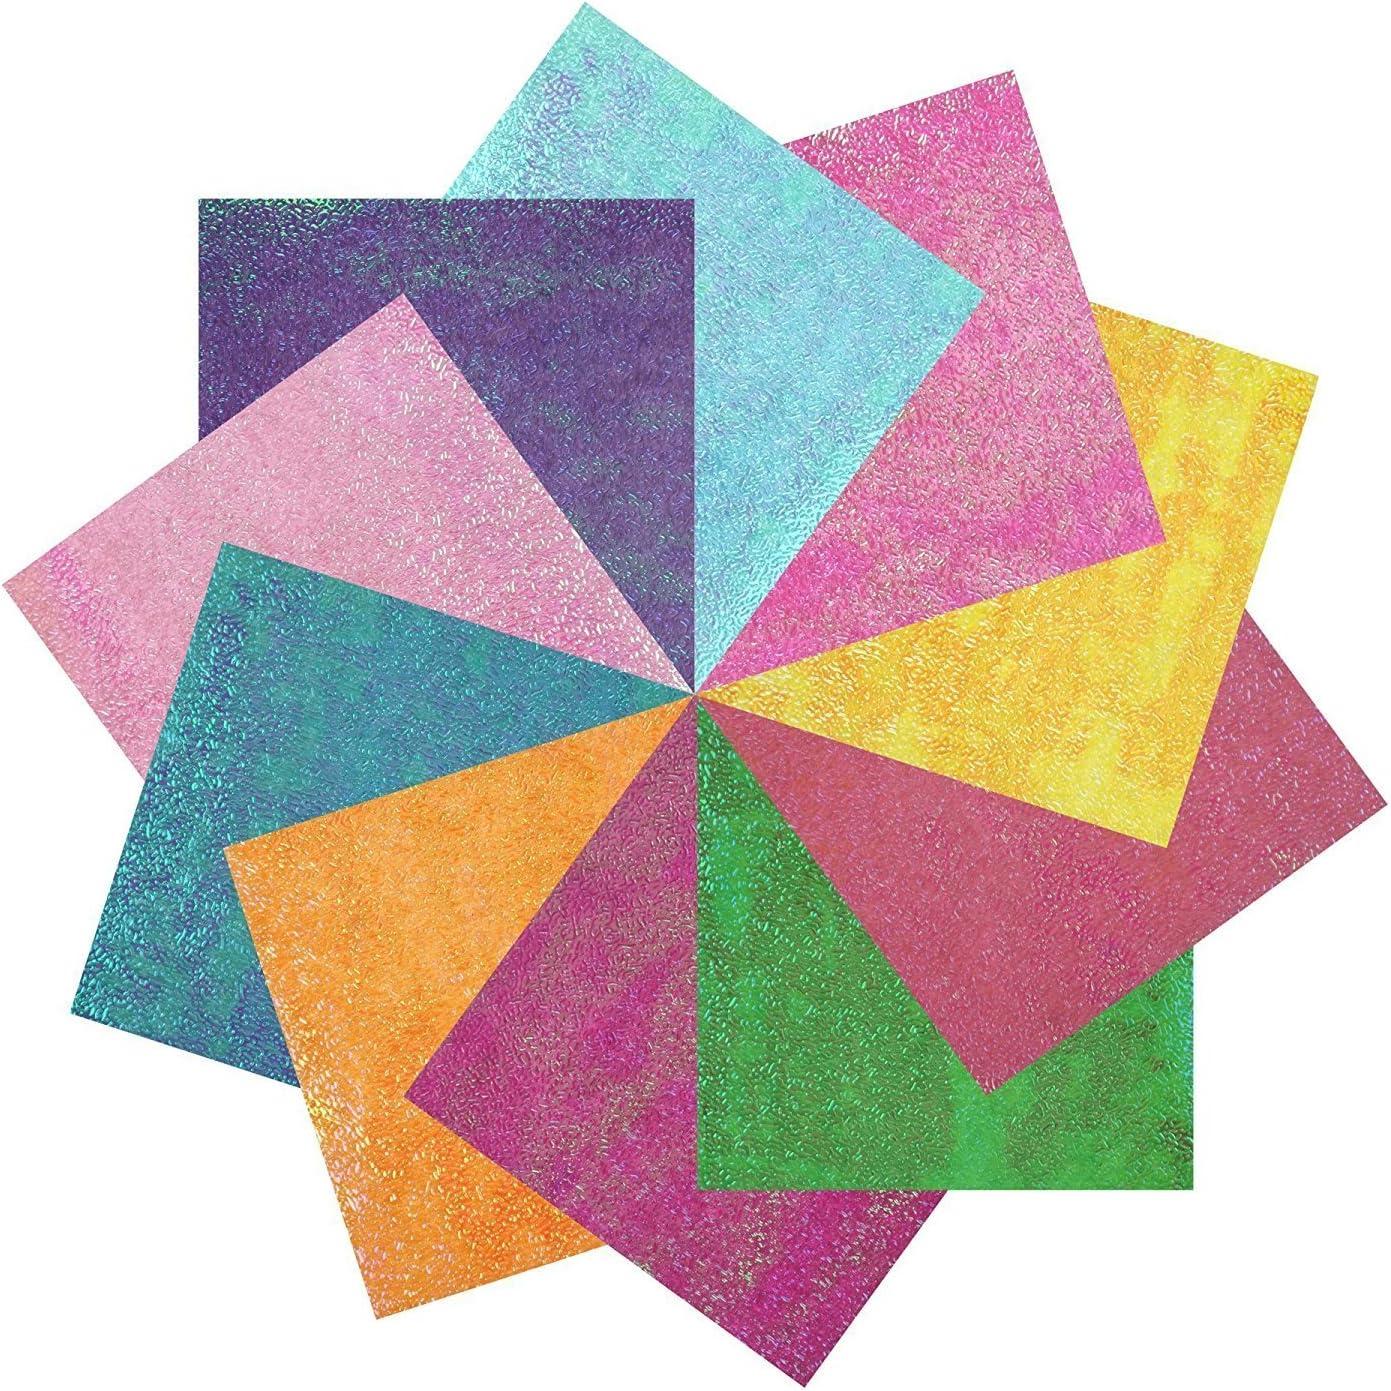 4 origami Paper Crane Instructions | Origami paper crane, Origami ... | 1404x1408